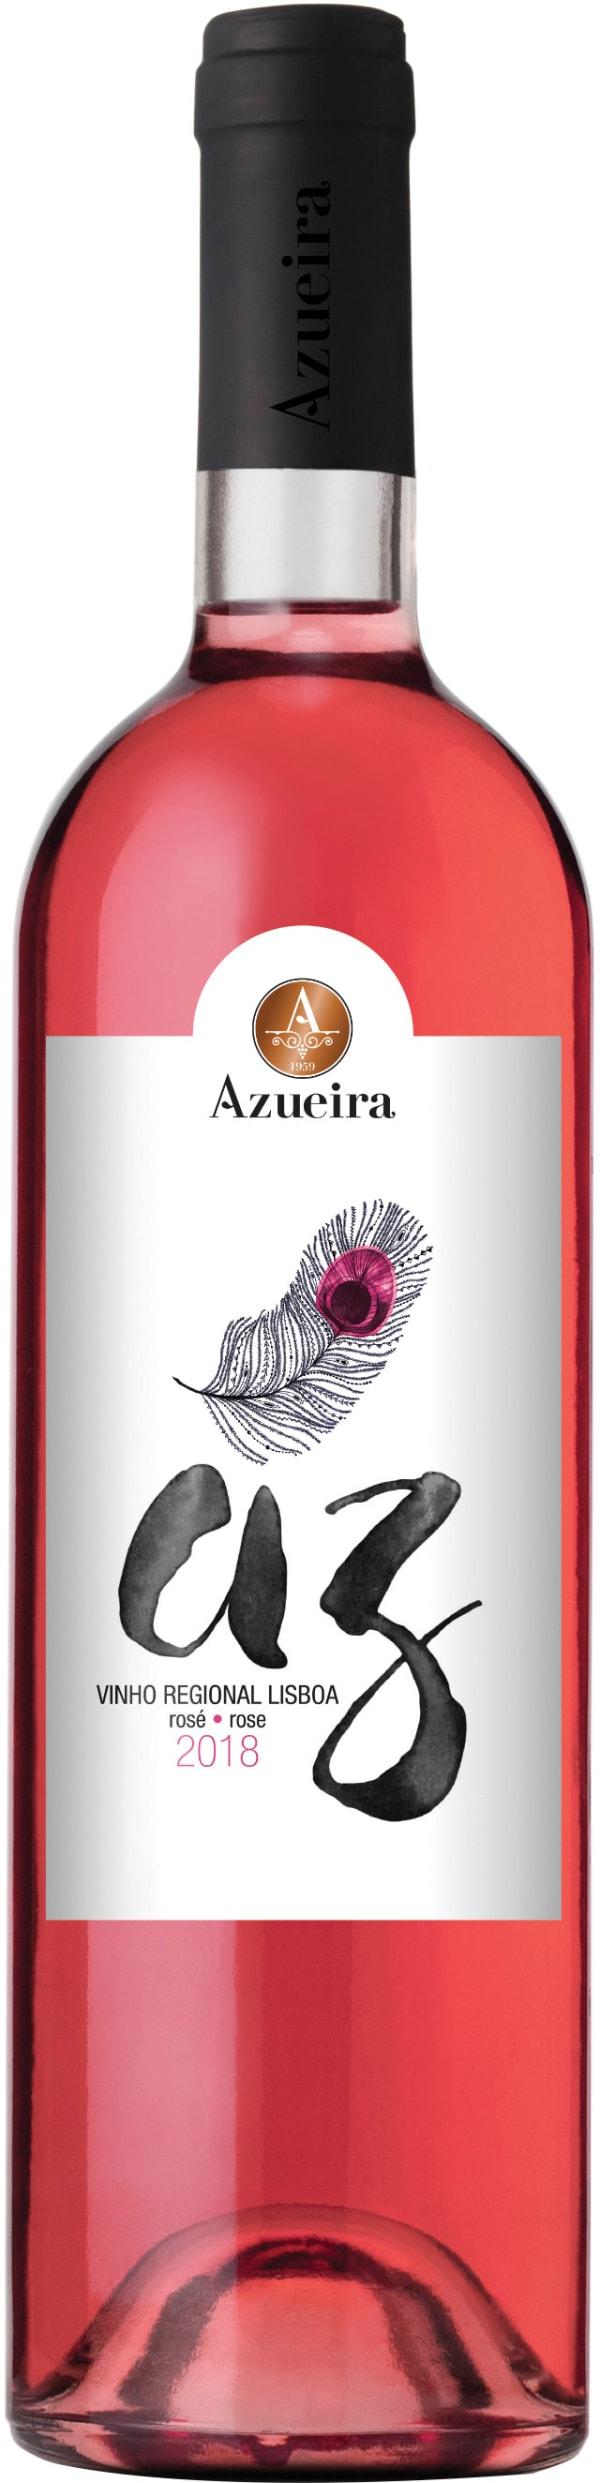 Azueira AZ Rose 2018